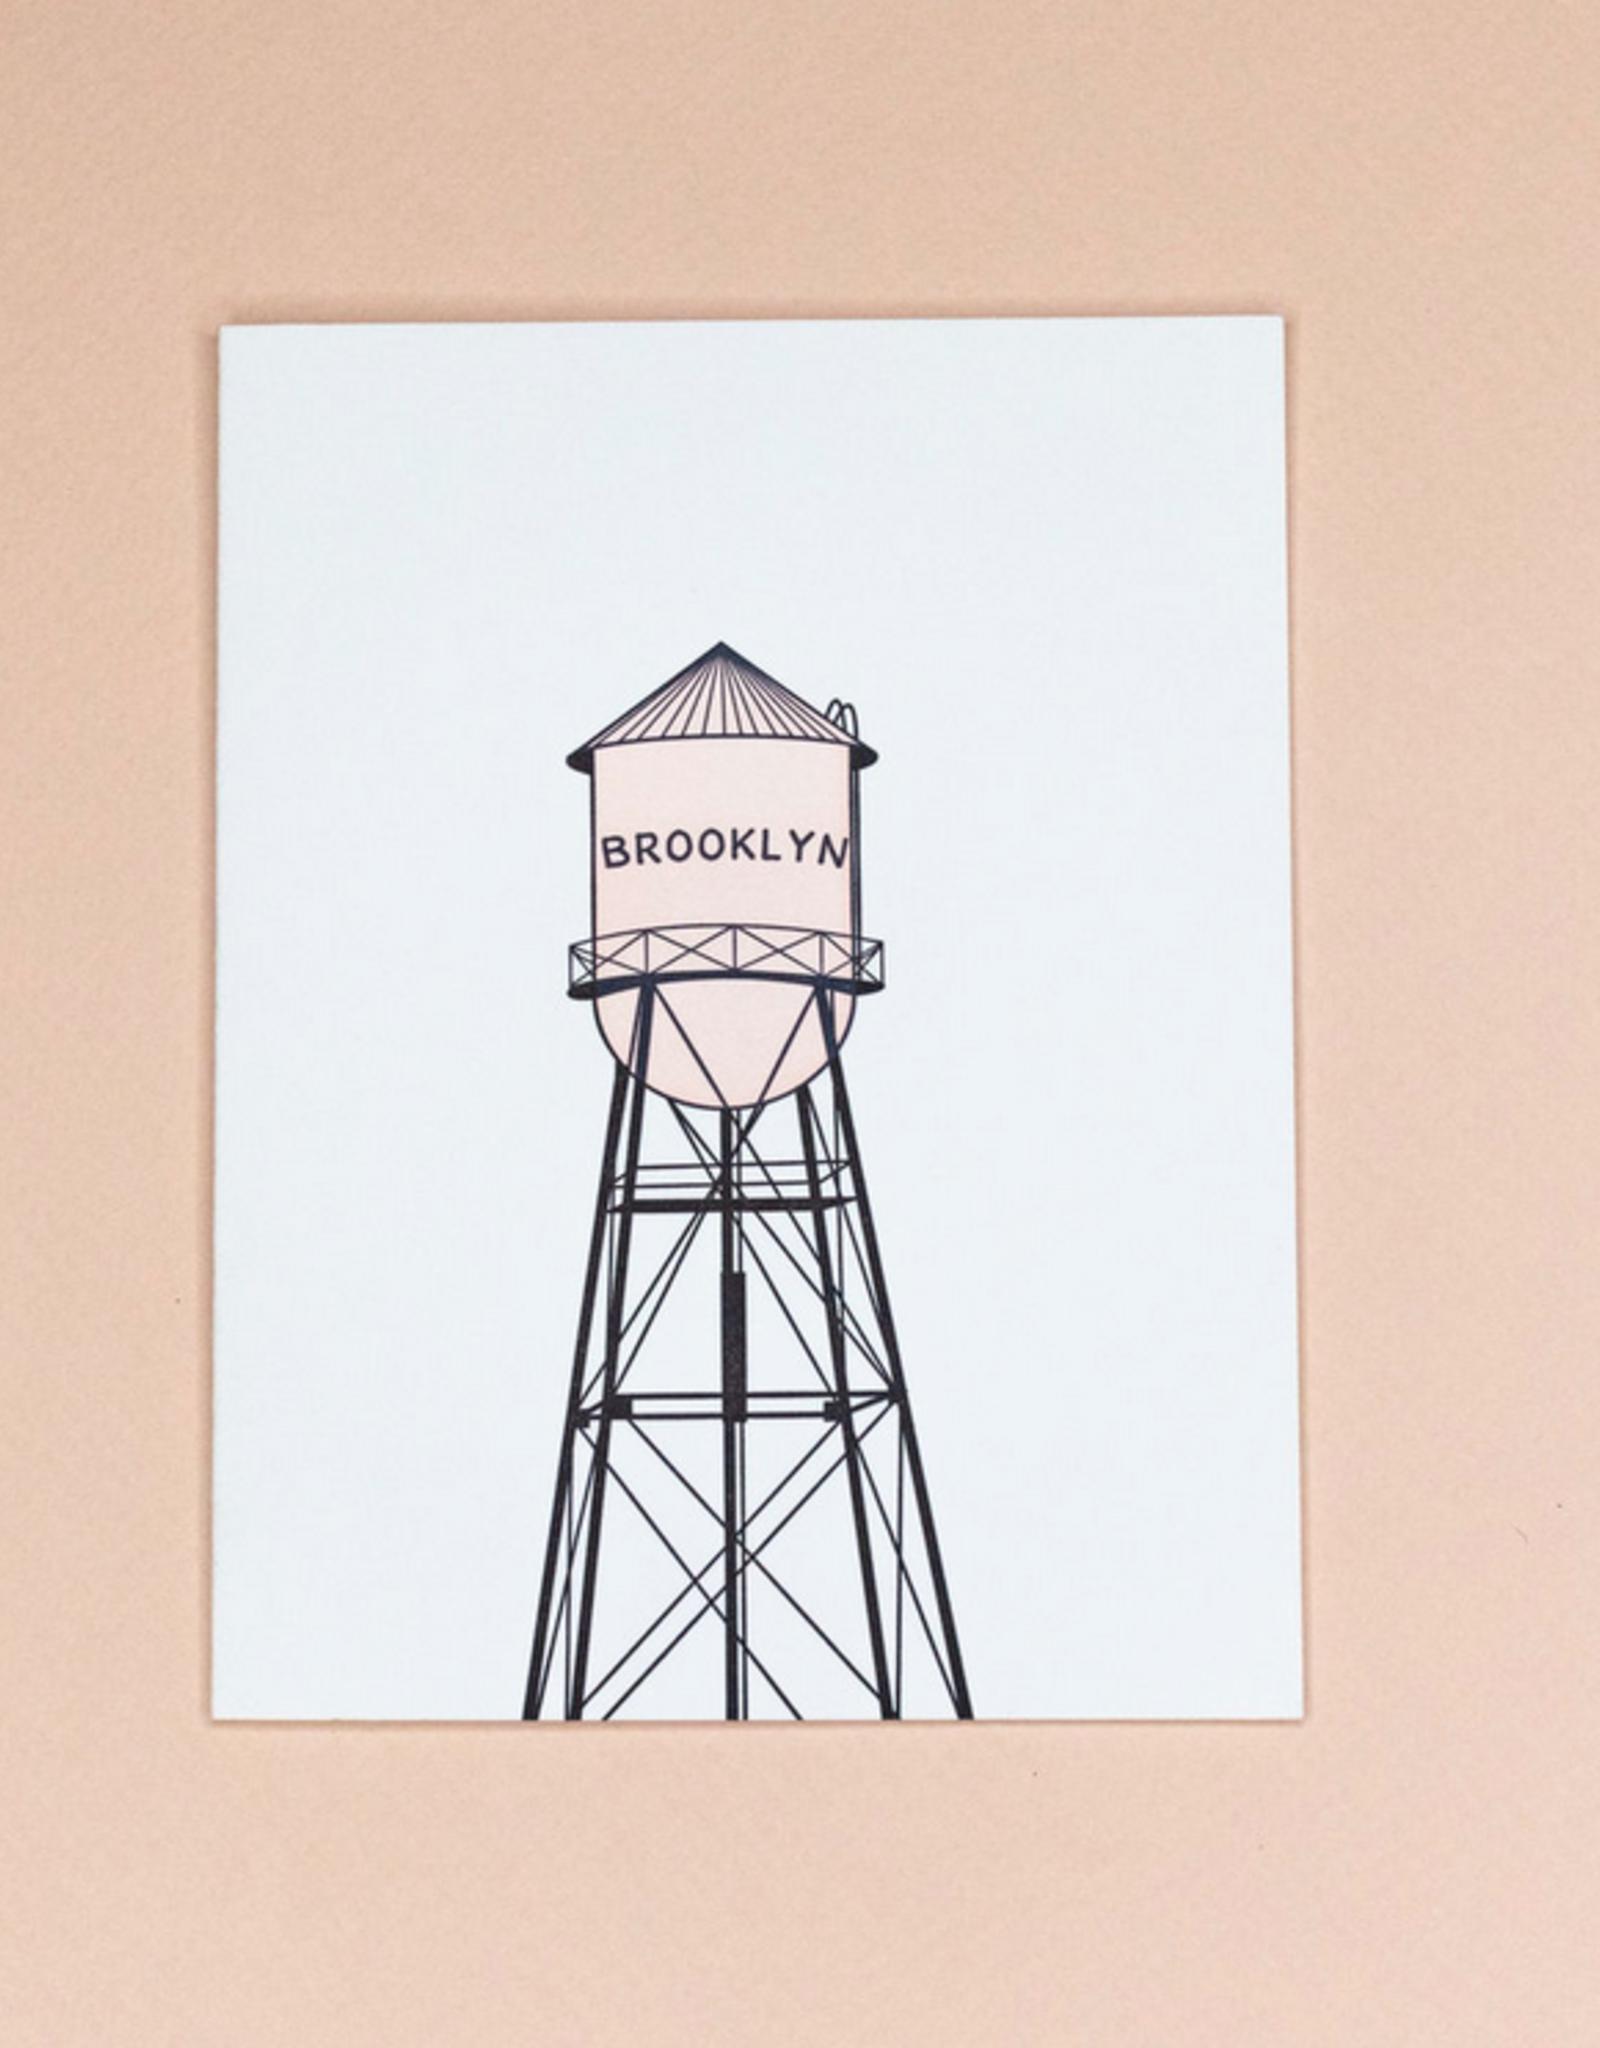 Card - Blank: Brooklyn Watertower